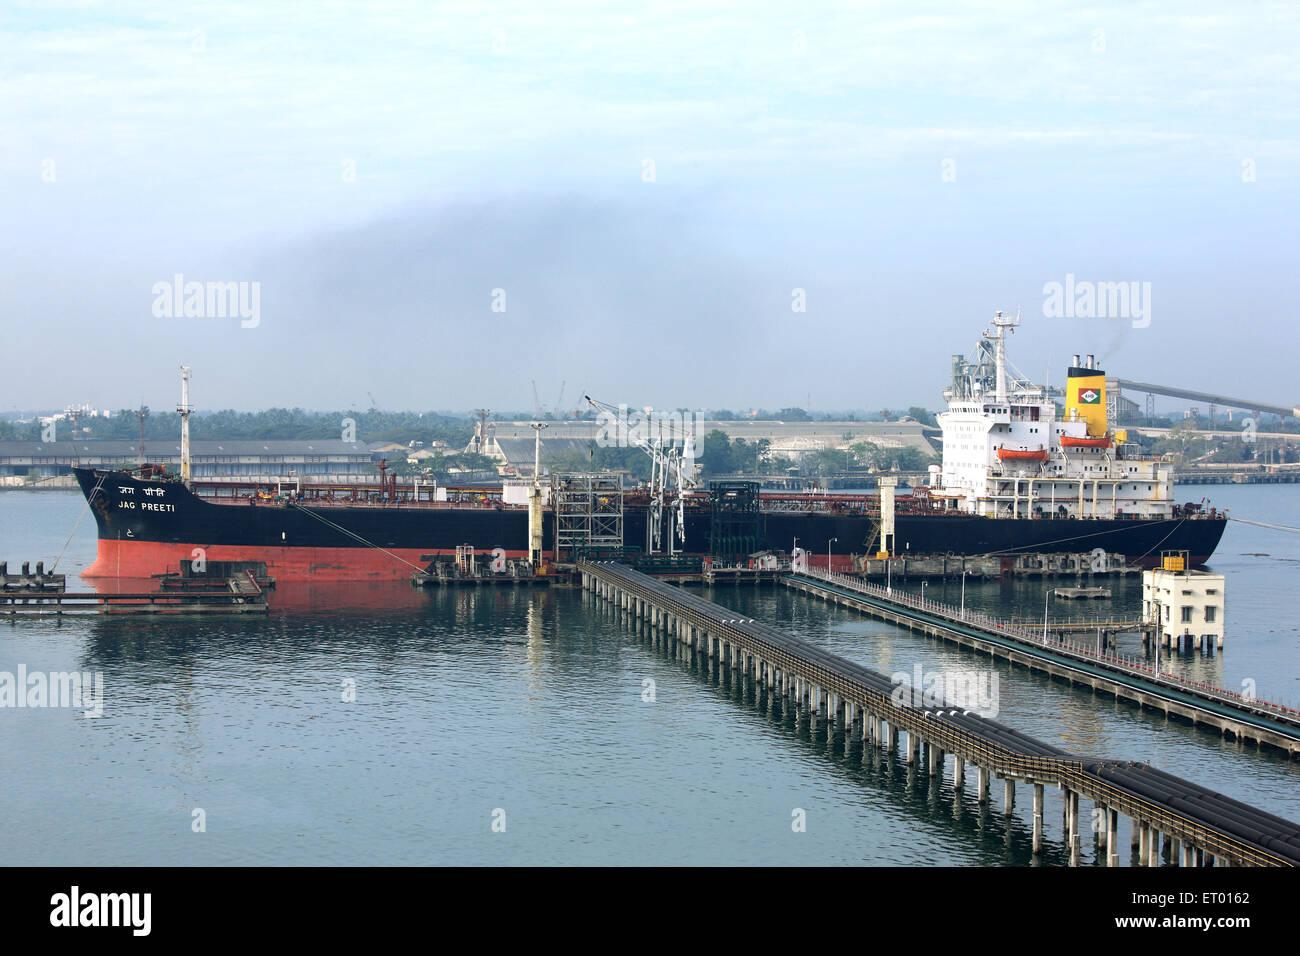 Oil tanker unloading at oil jetty of Cochin Kochi harbour